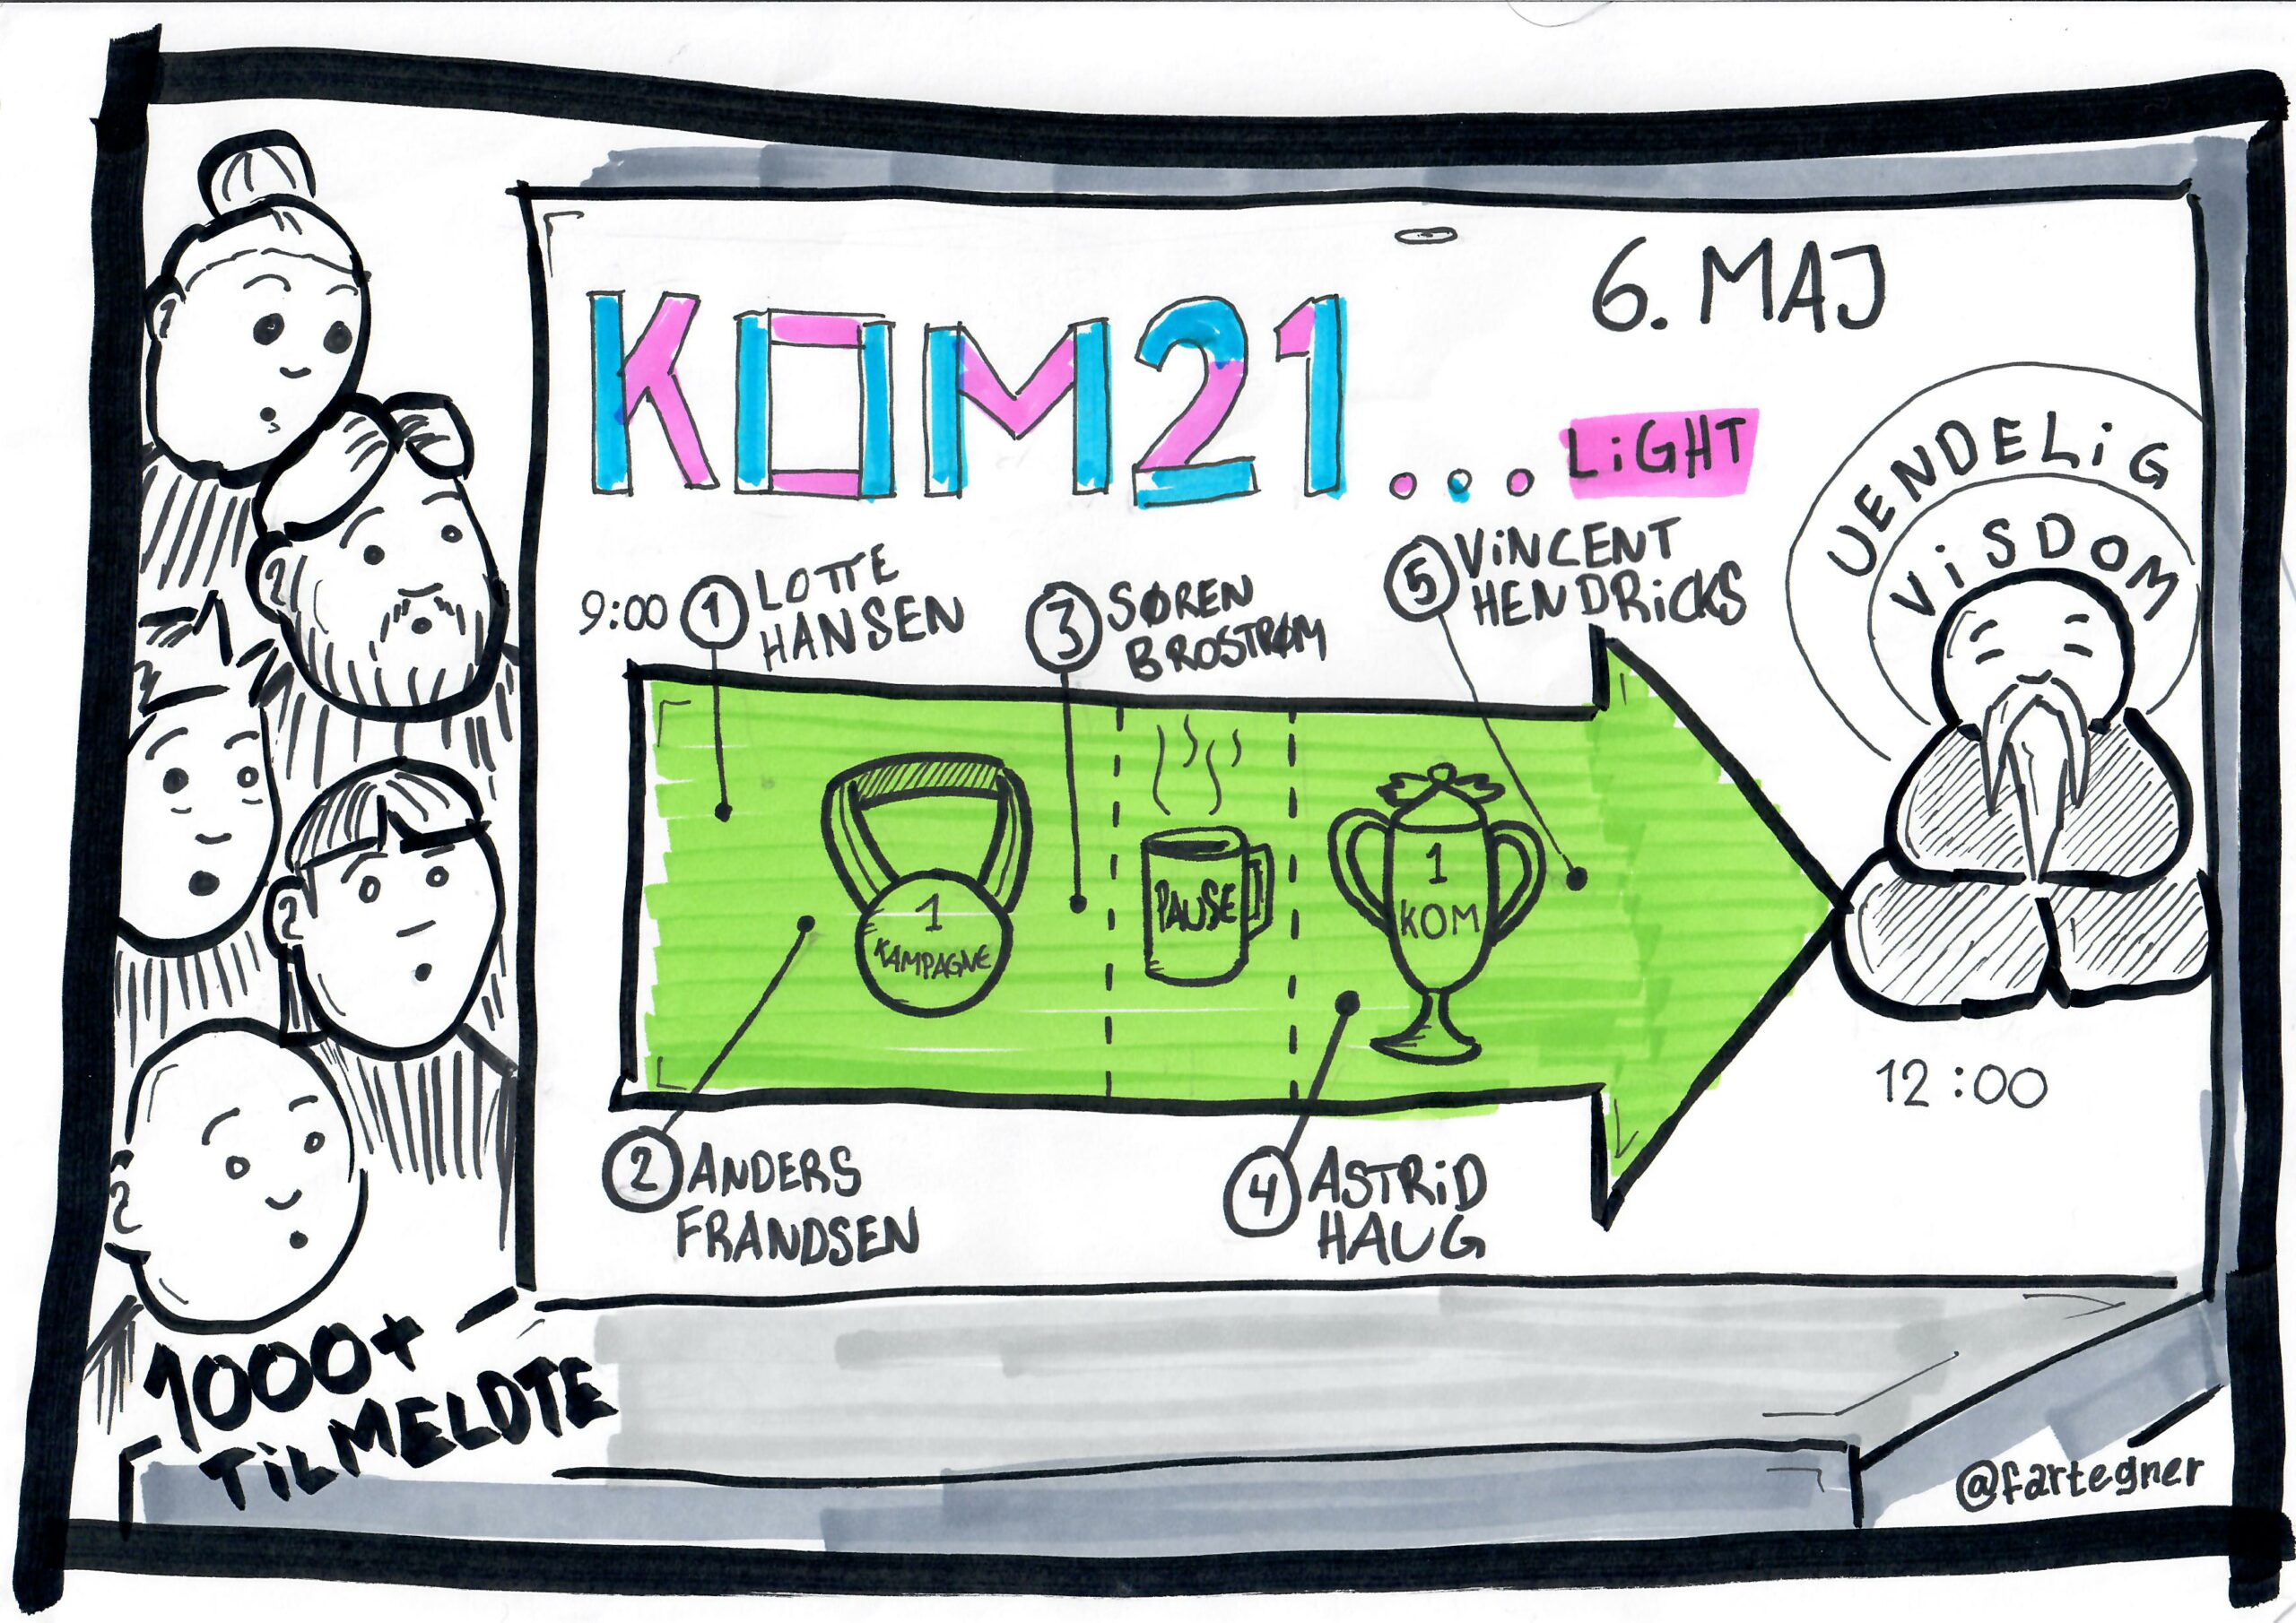 Visuelt referat fra KOM21